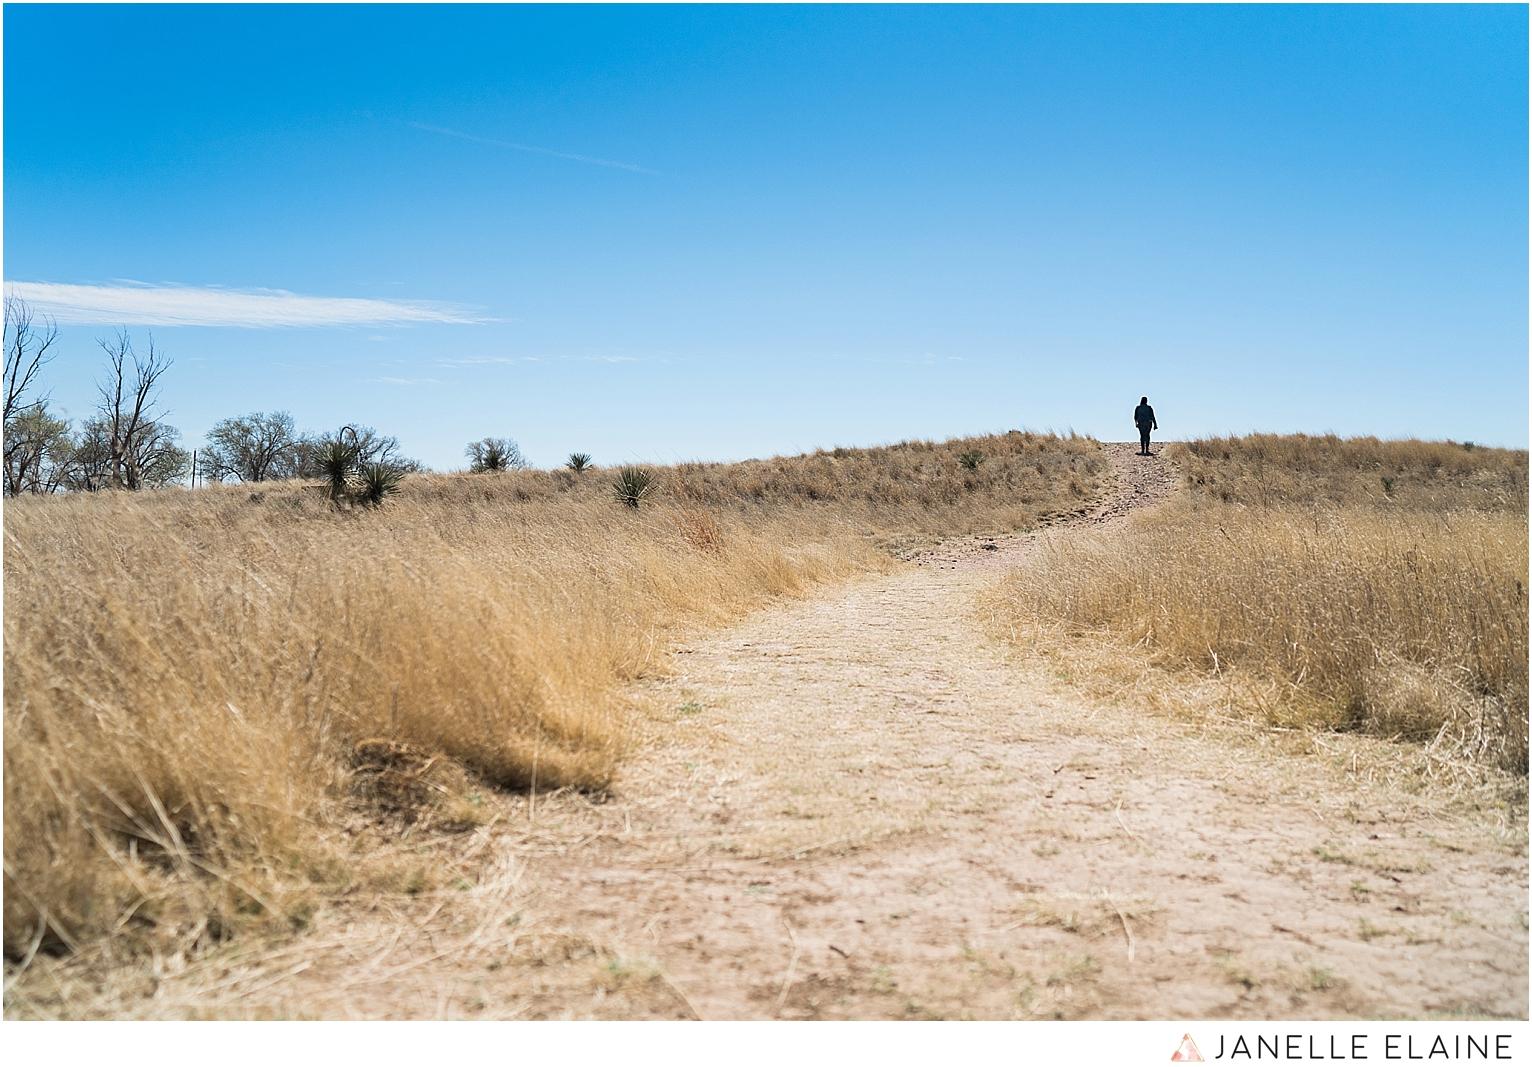 yeah field trip-el cosmico-marfa texas-janelle elaine photography-164.jpg